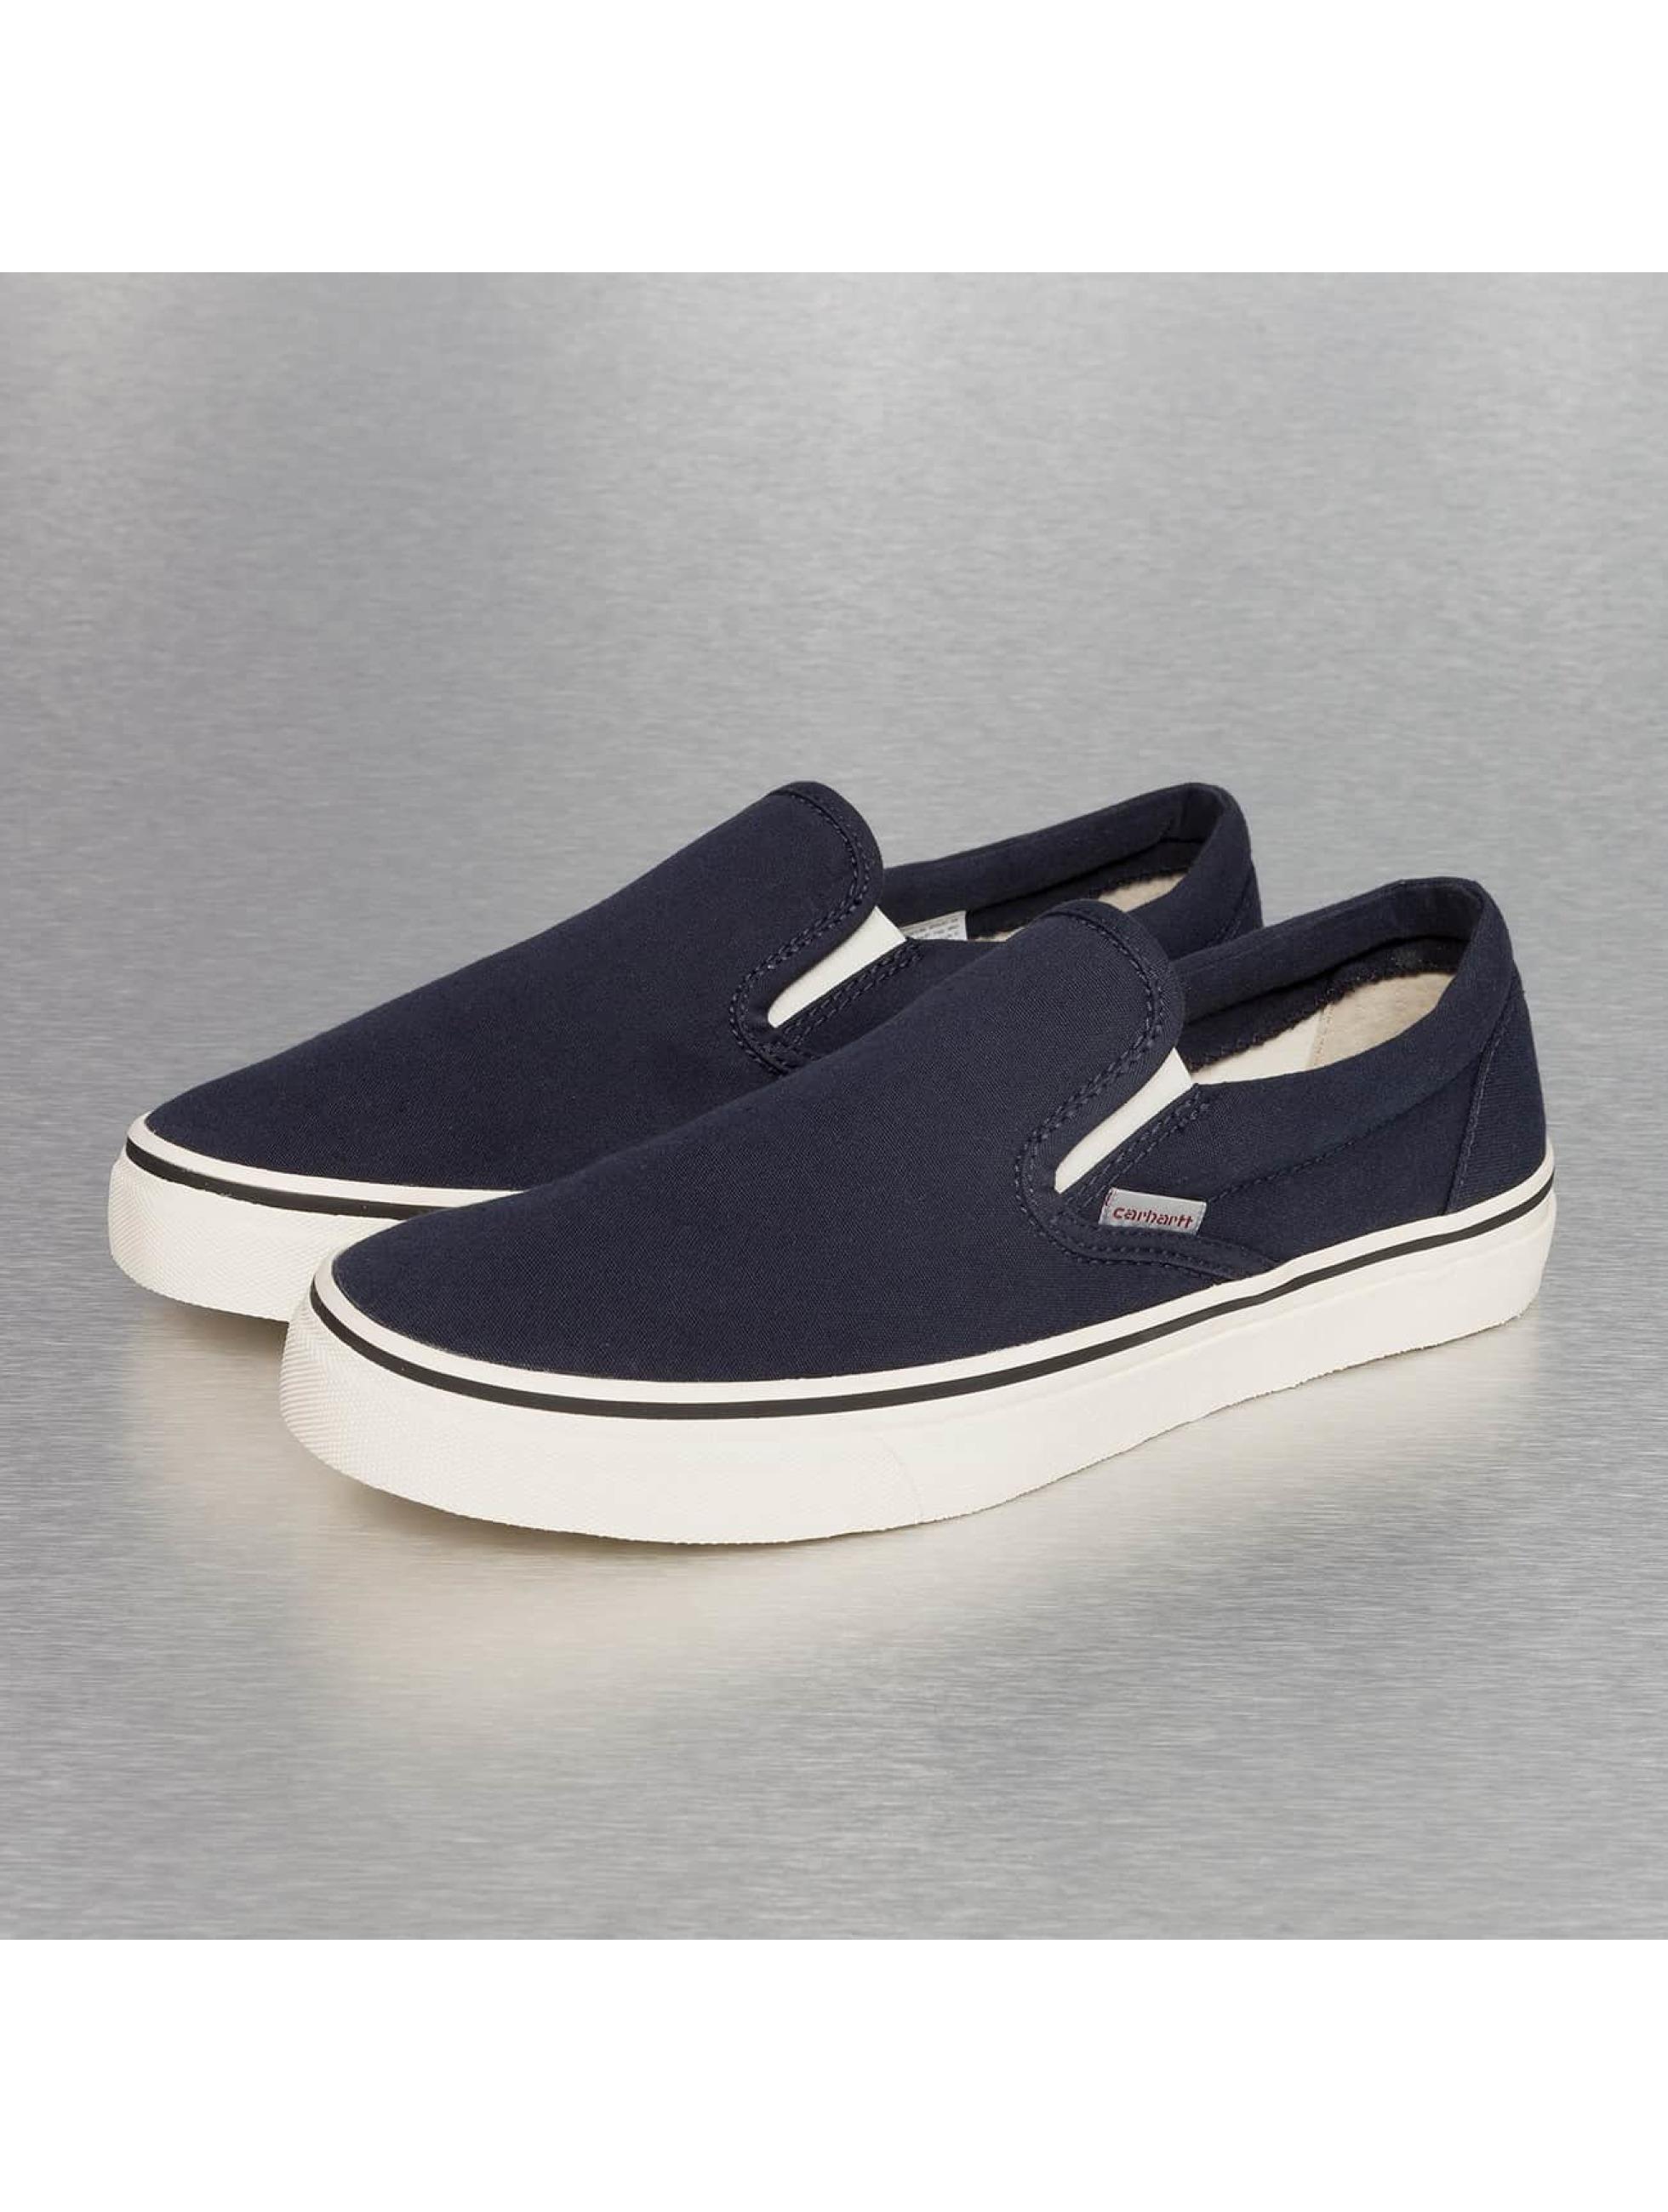 Carhartt WIP Sneaker Chicago blau